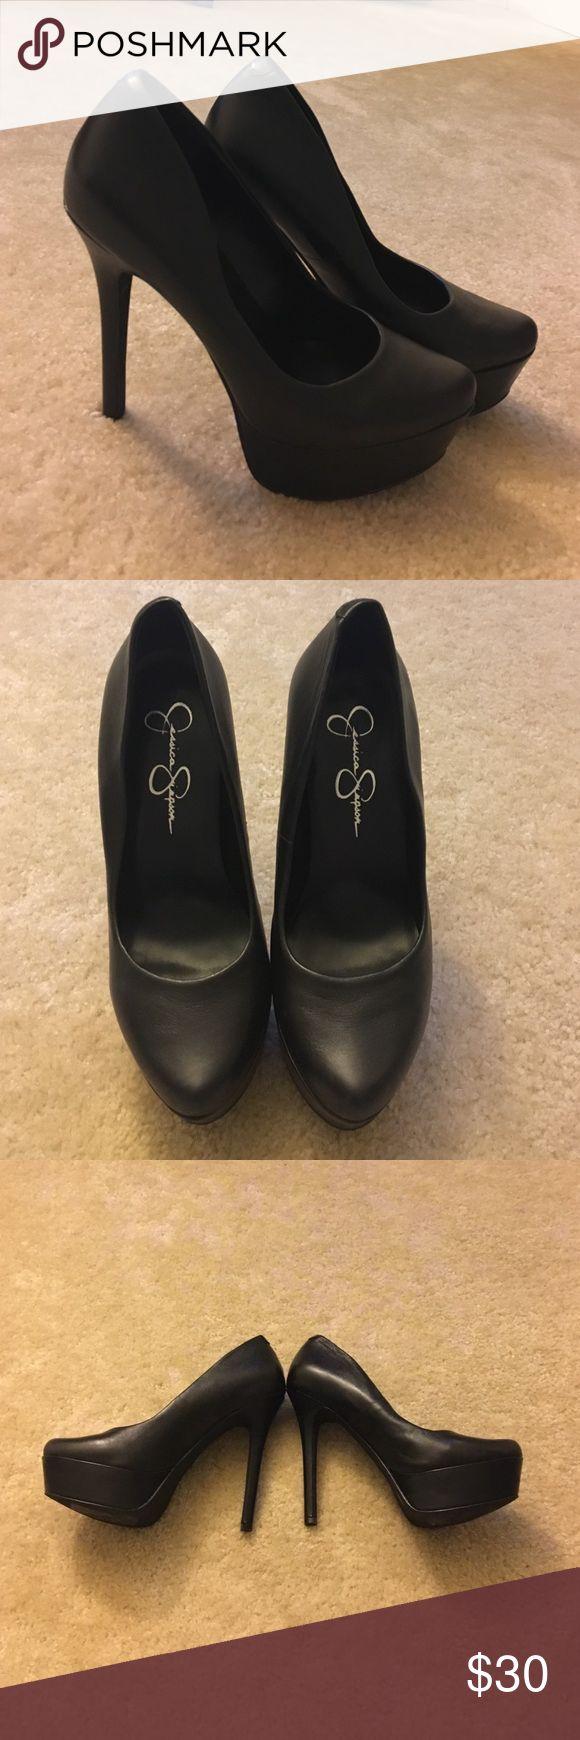 Jessica Simpson Black Leather Waleo Pumps  Jessica Simpson Black Leather Waleo Pumps / Size 6 / Good Condition Jessica Simpson Shoes Heels